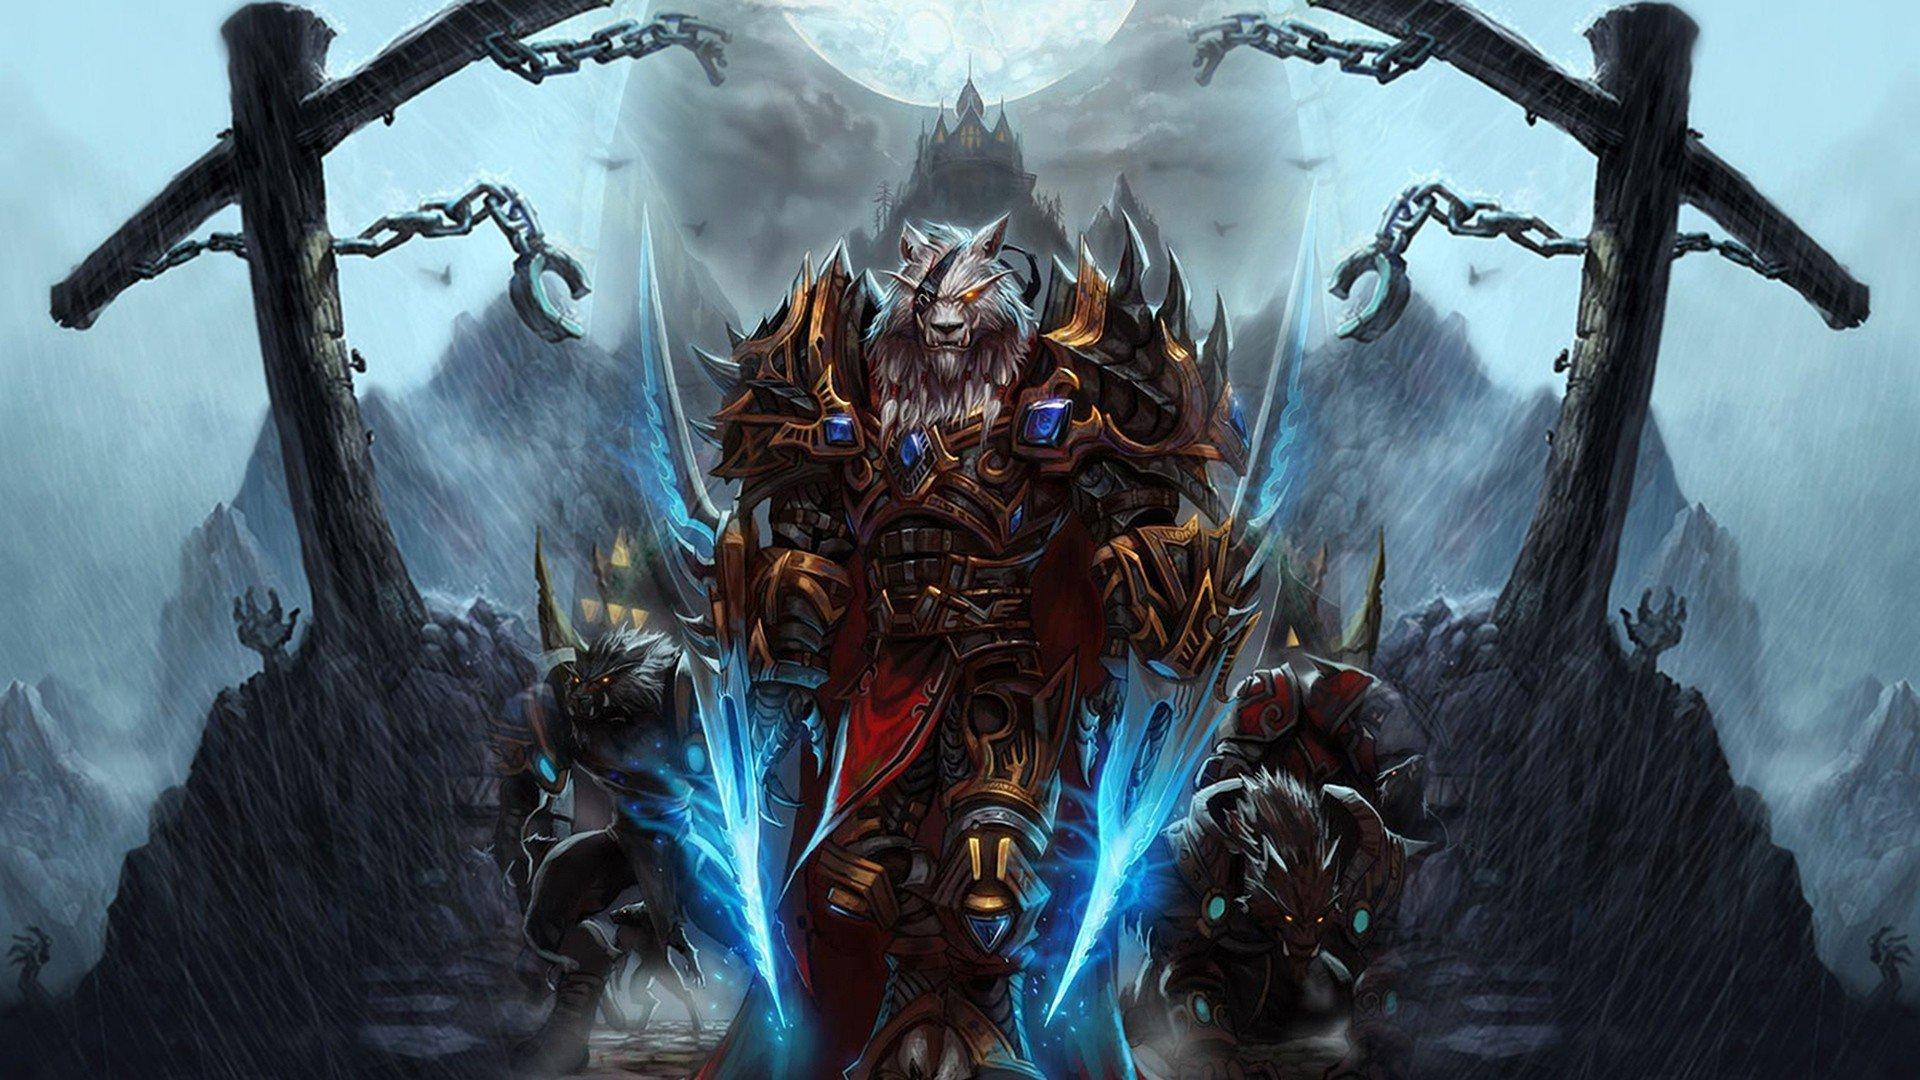 World Of Warcraft 4k Wallpaper: World Of Warcraft Worgen Character, HD Games, 4k